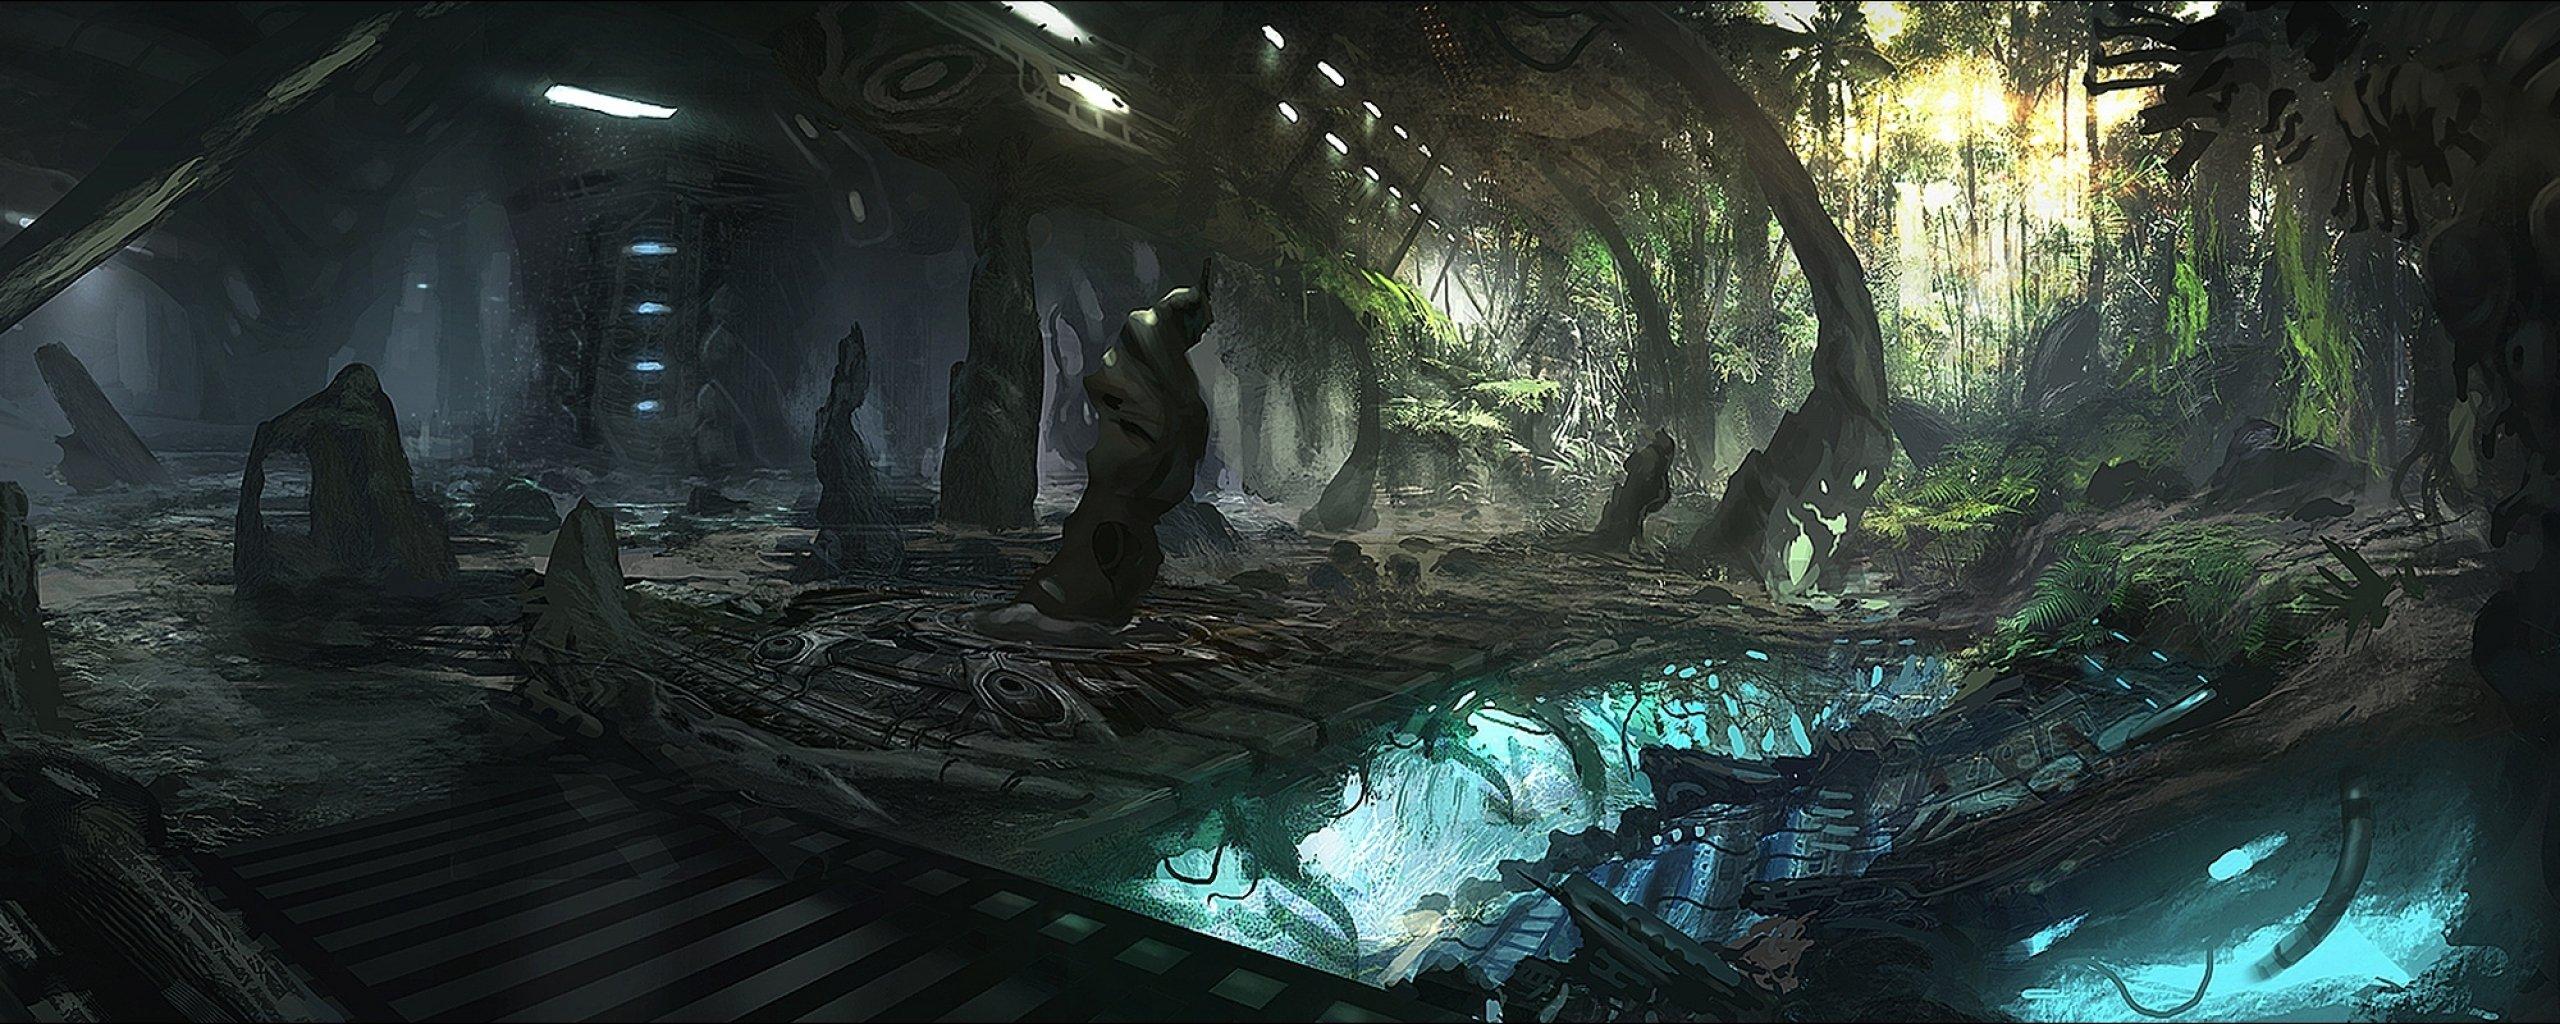 alien landscapes fantasy - HD2000×963